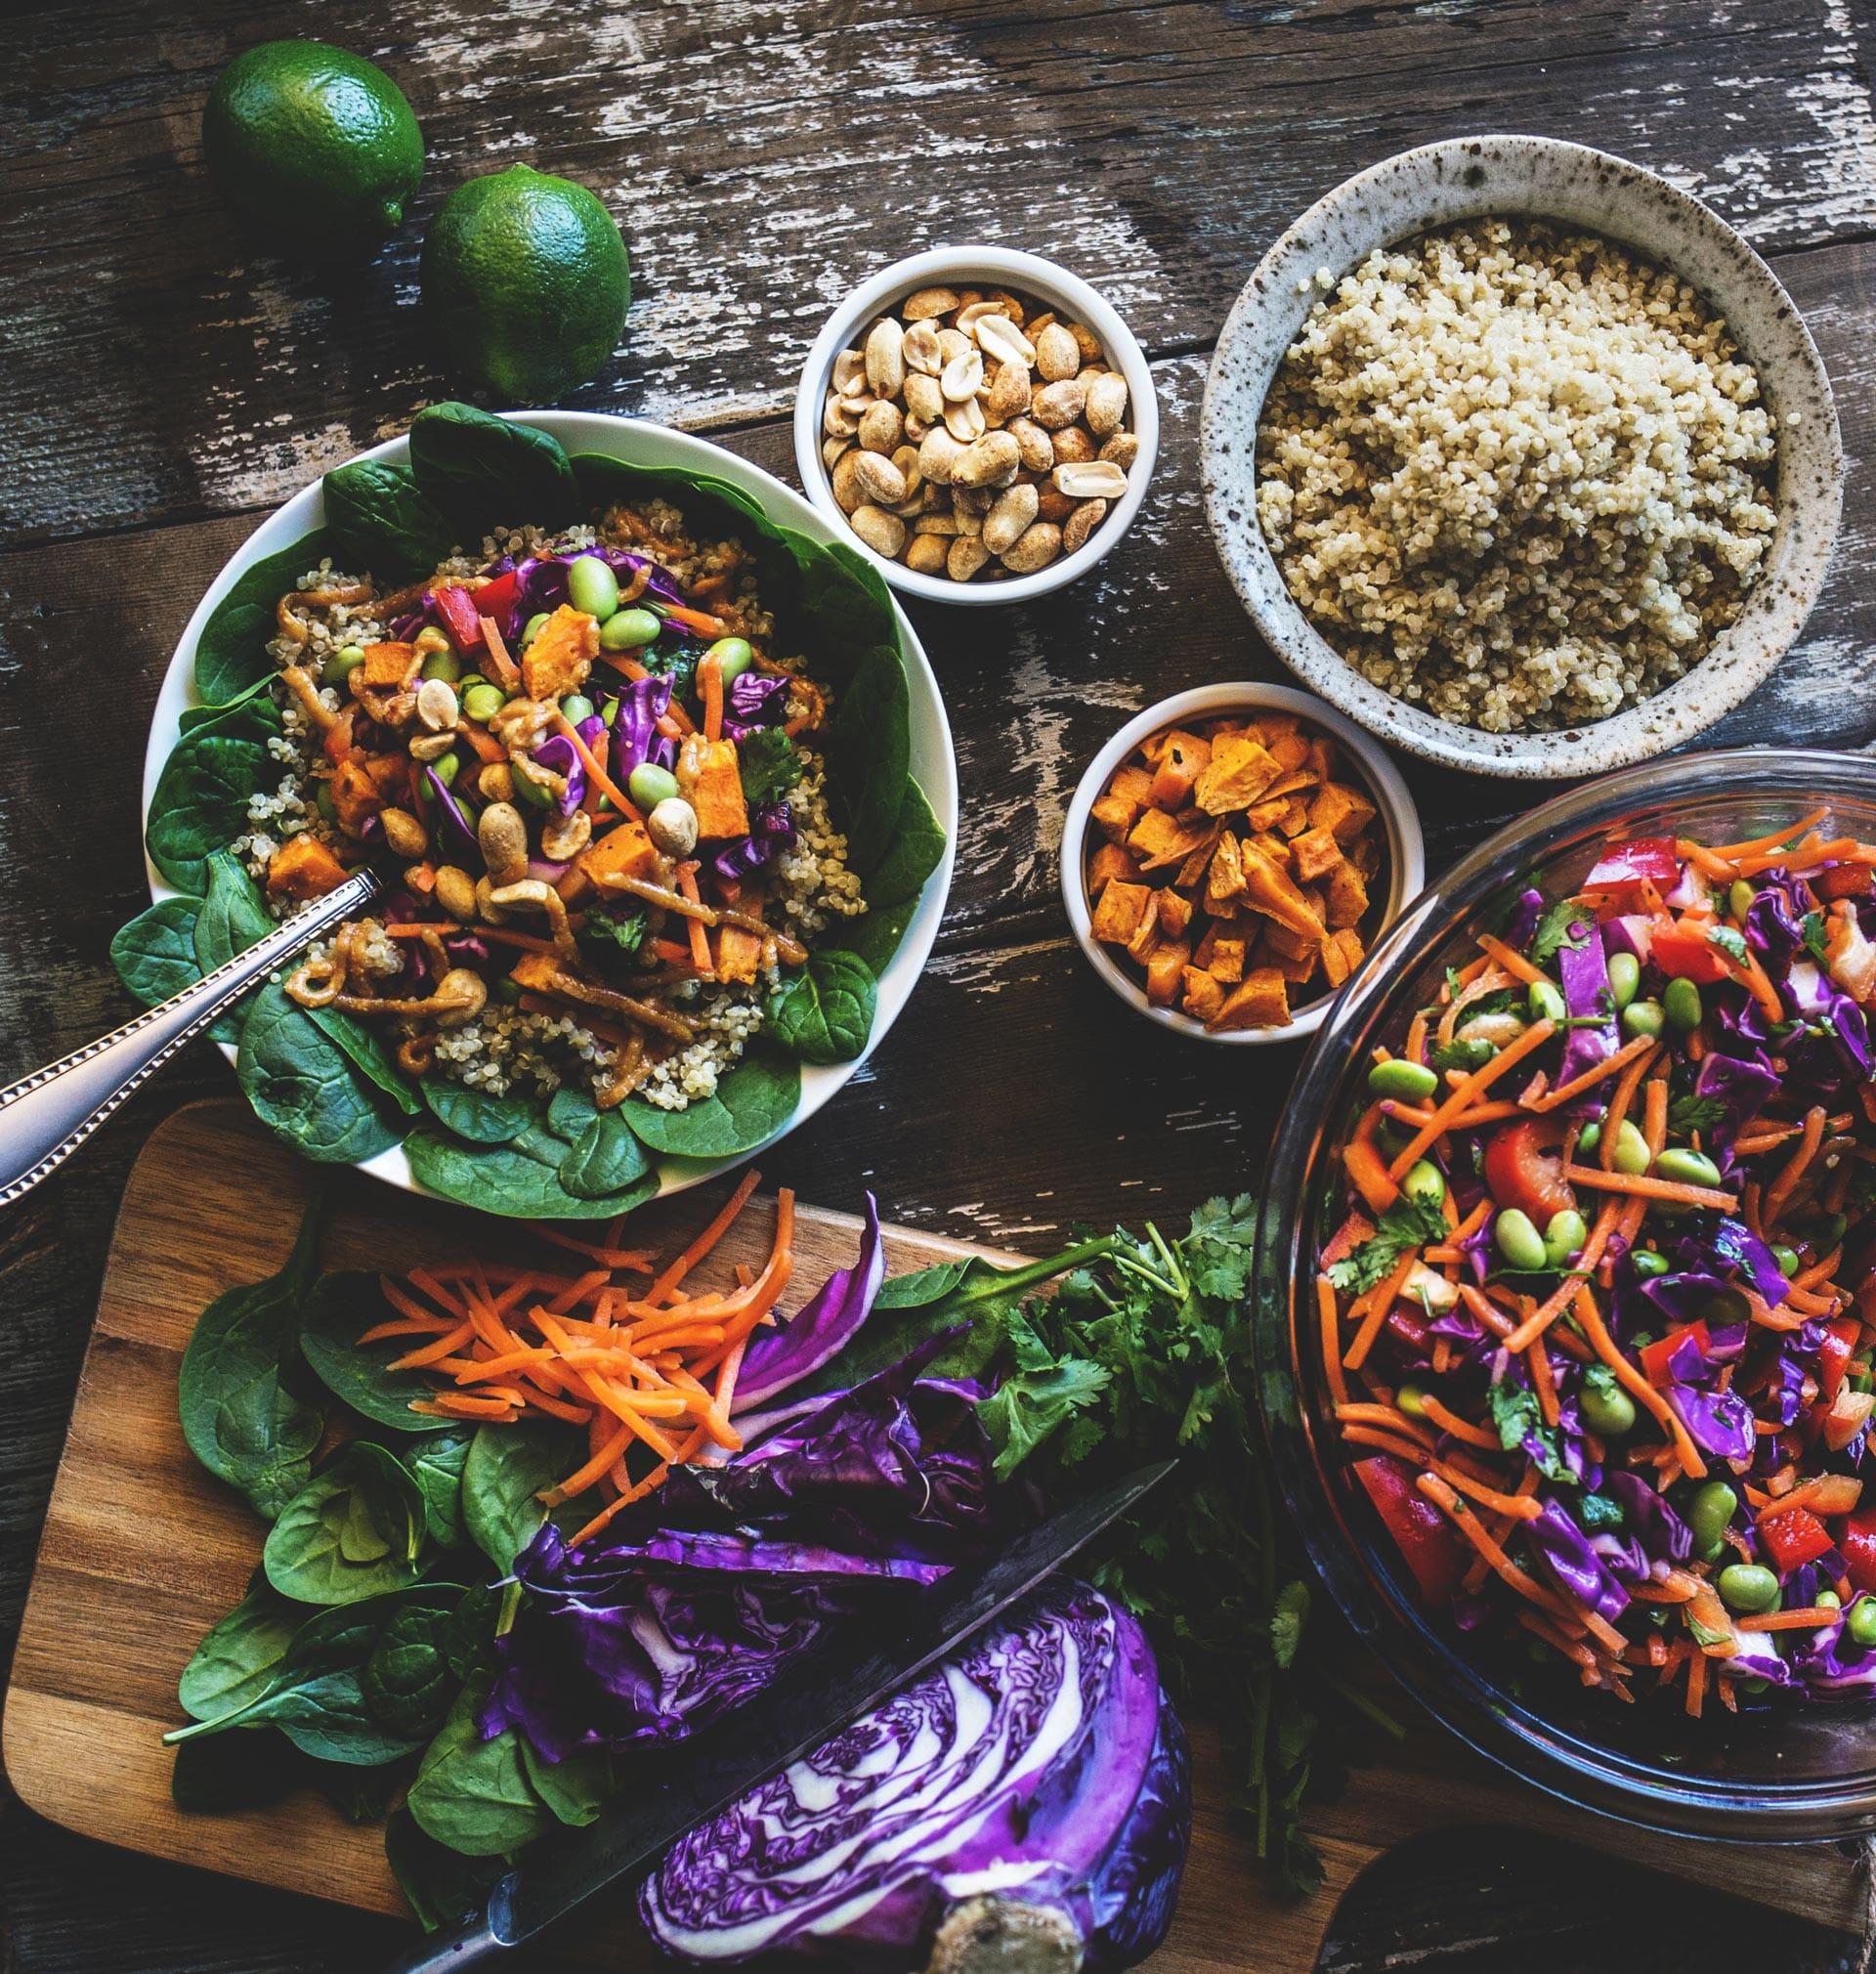 Creating Healthy, Allergen-Free Fall Menus